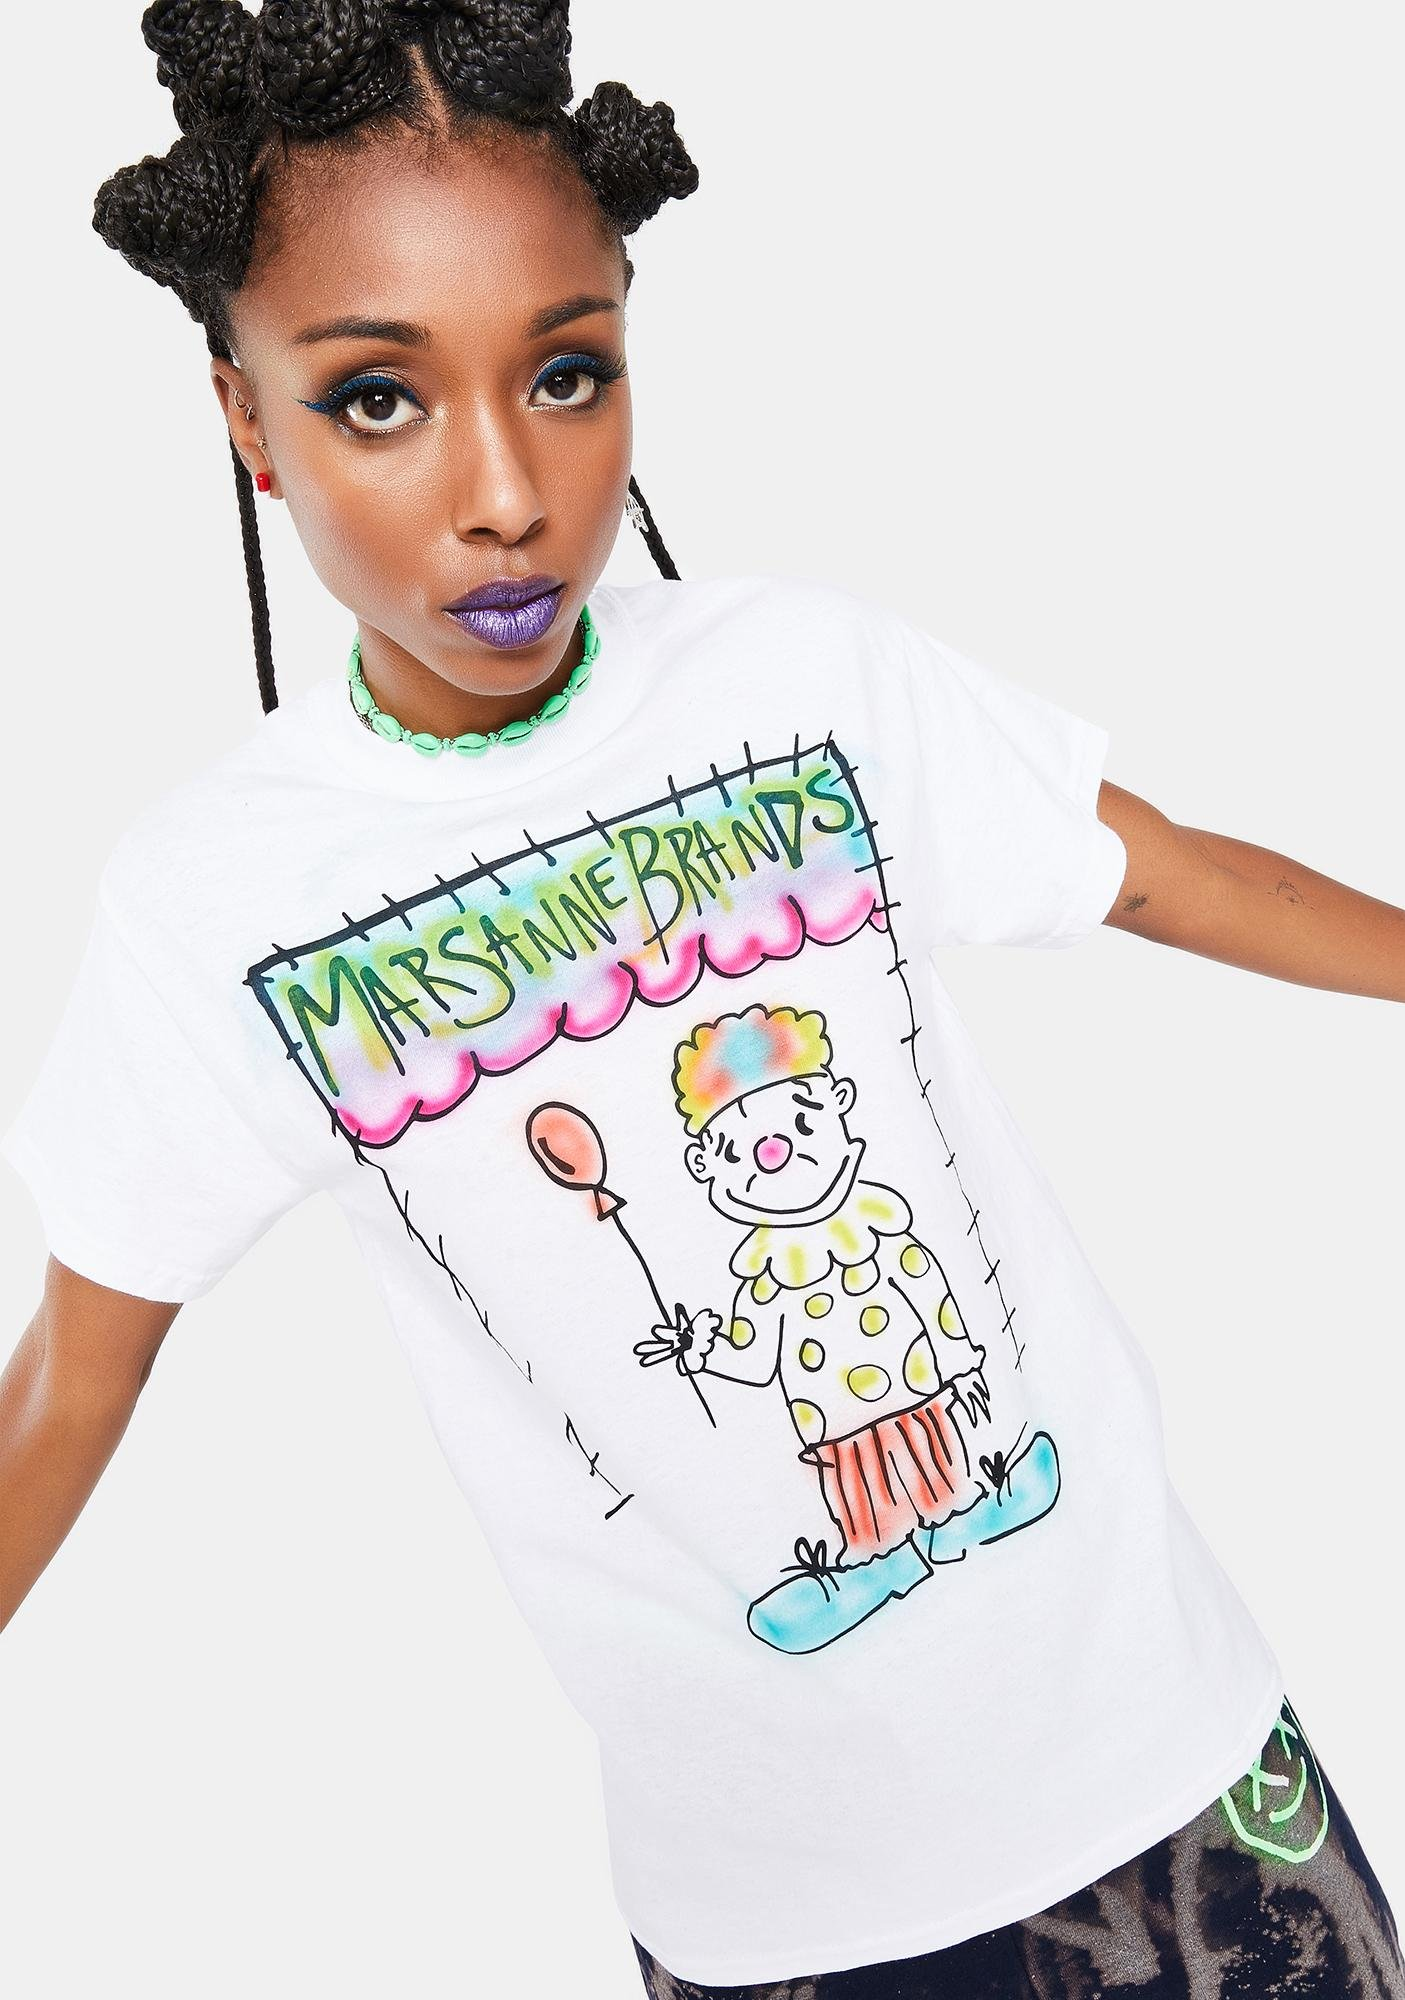 Marsanne Brands Sad Clown Graphic Tee